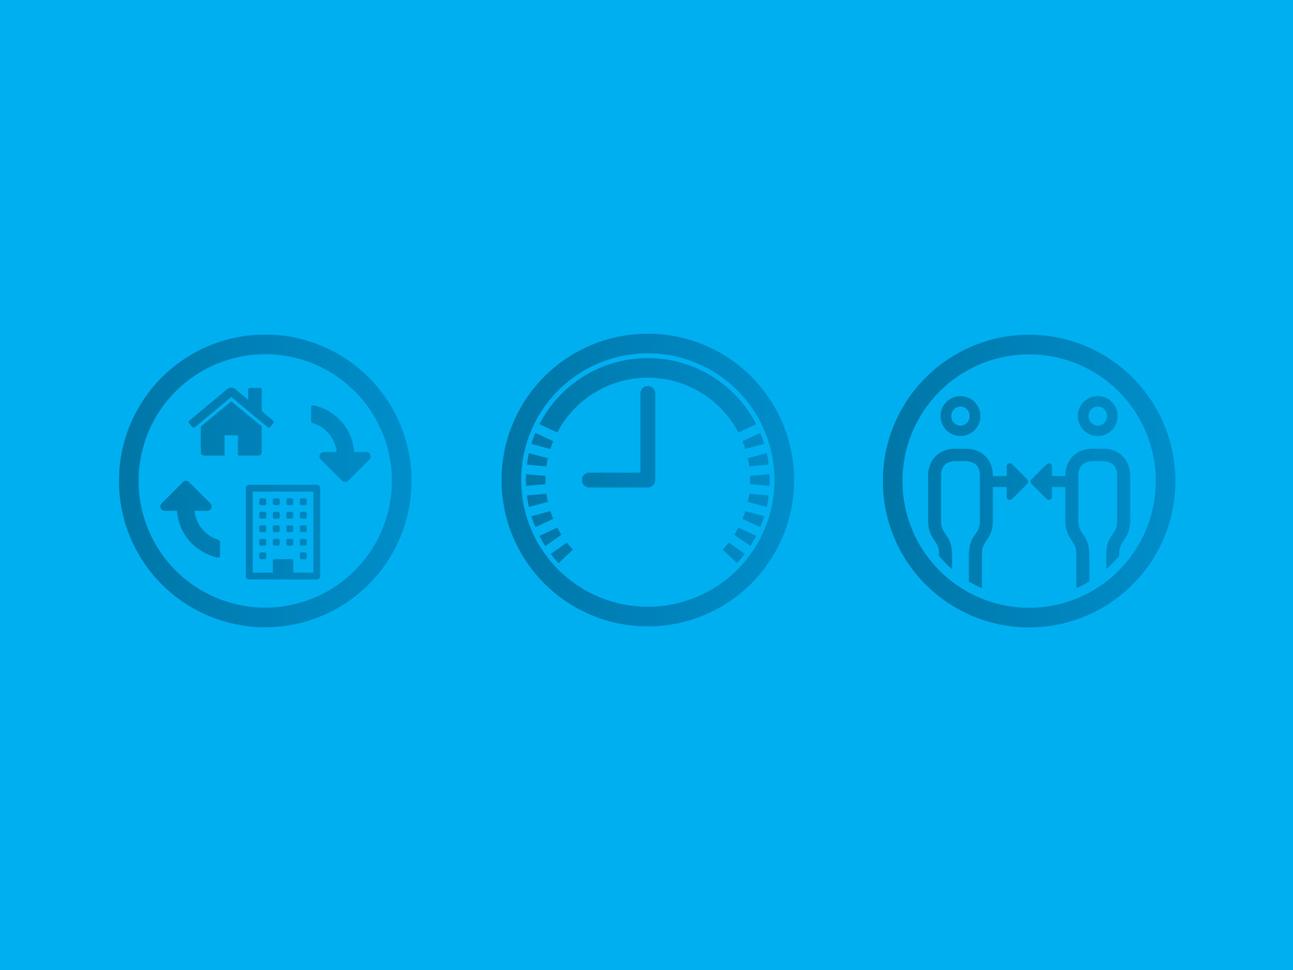 martin_zech_design_projekt_design_flexship_icons